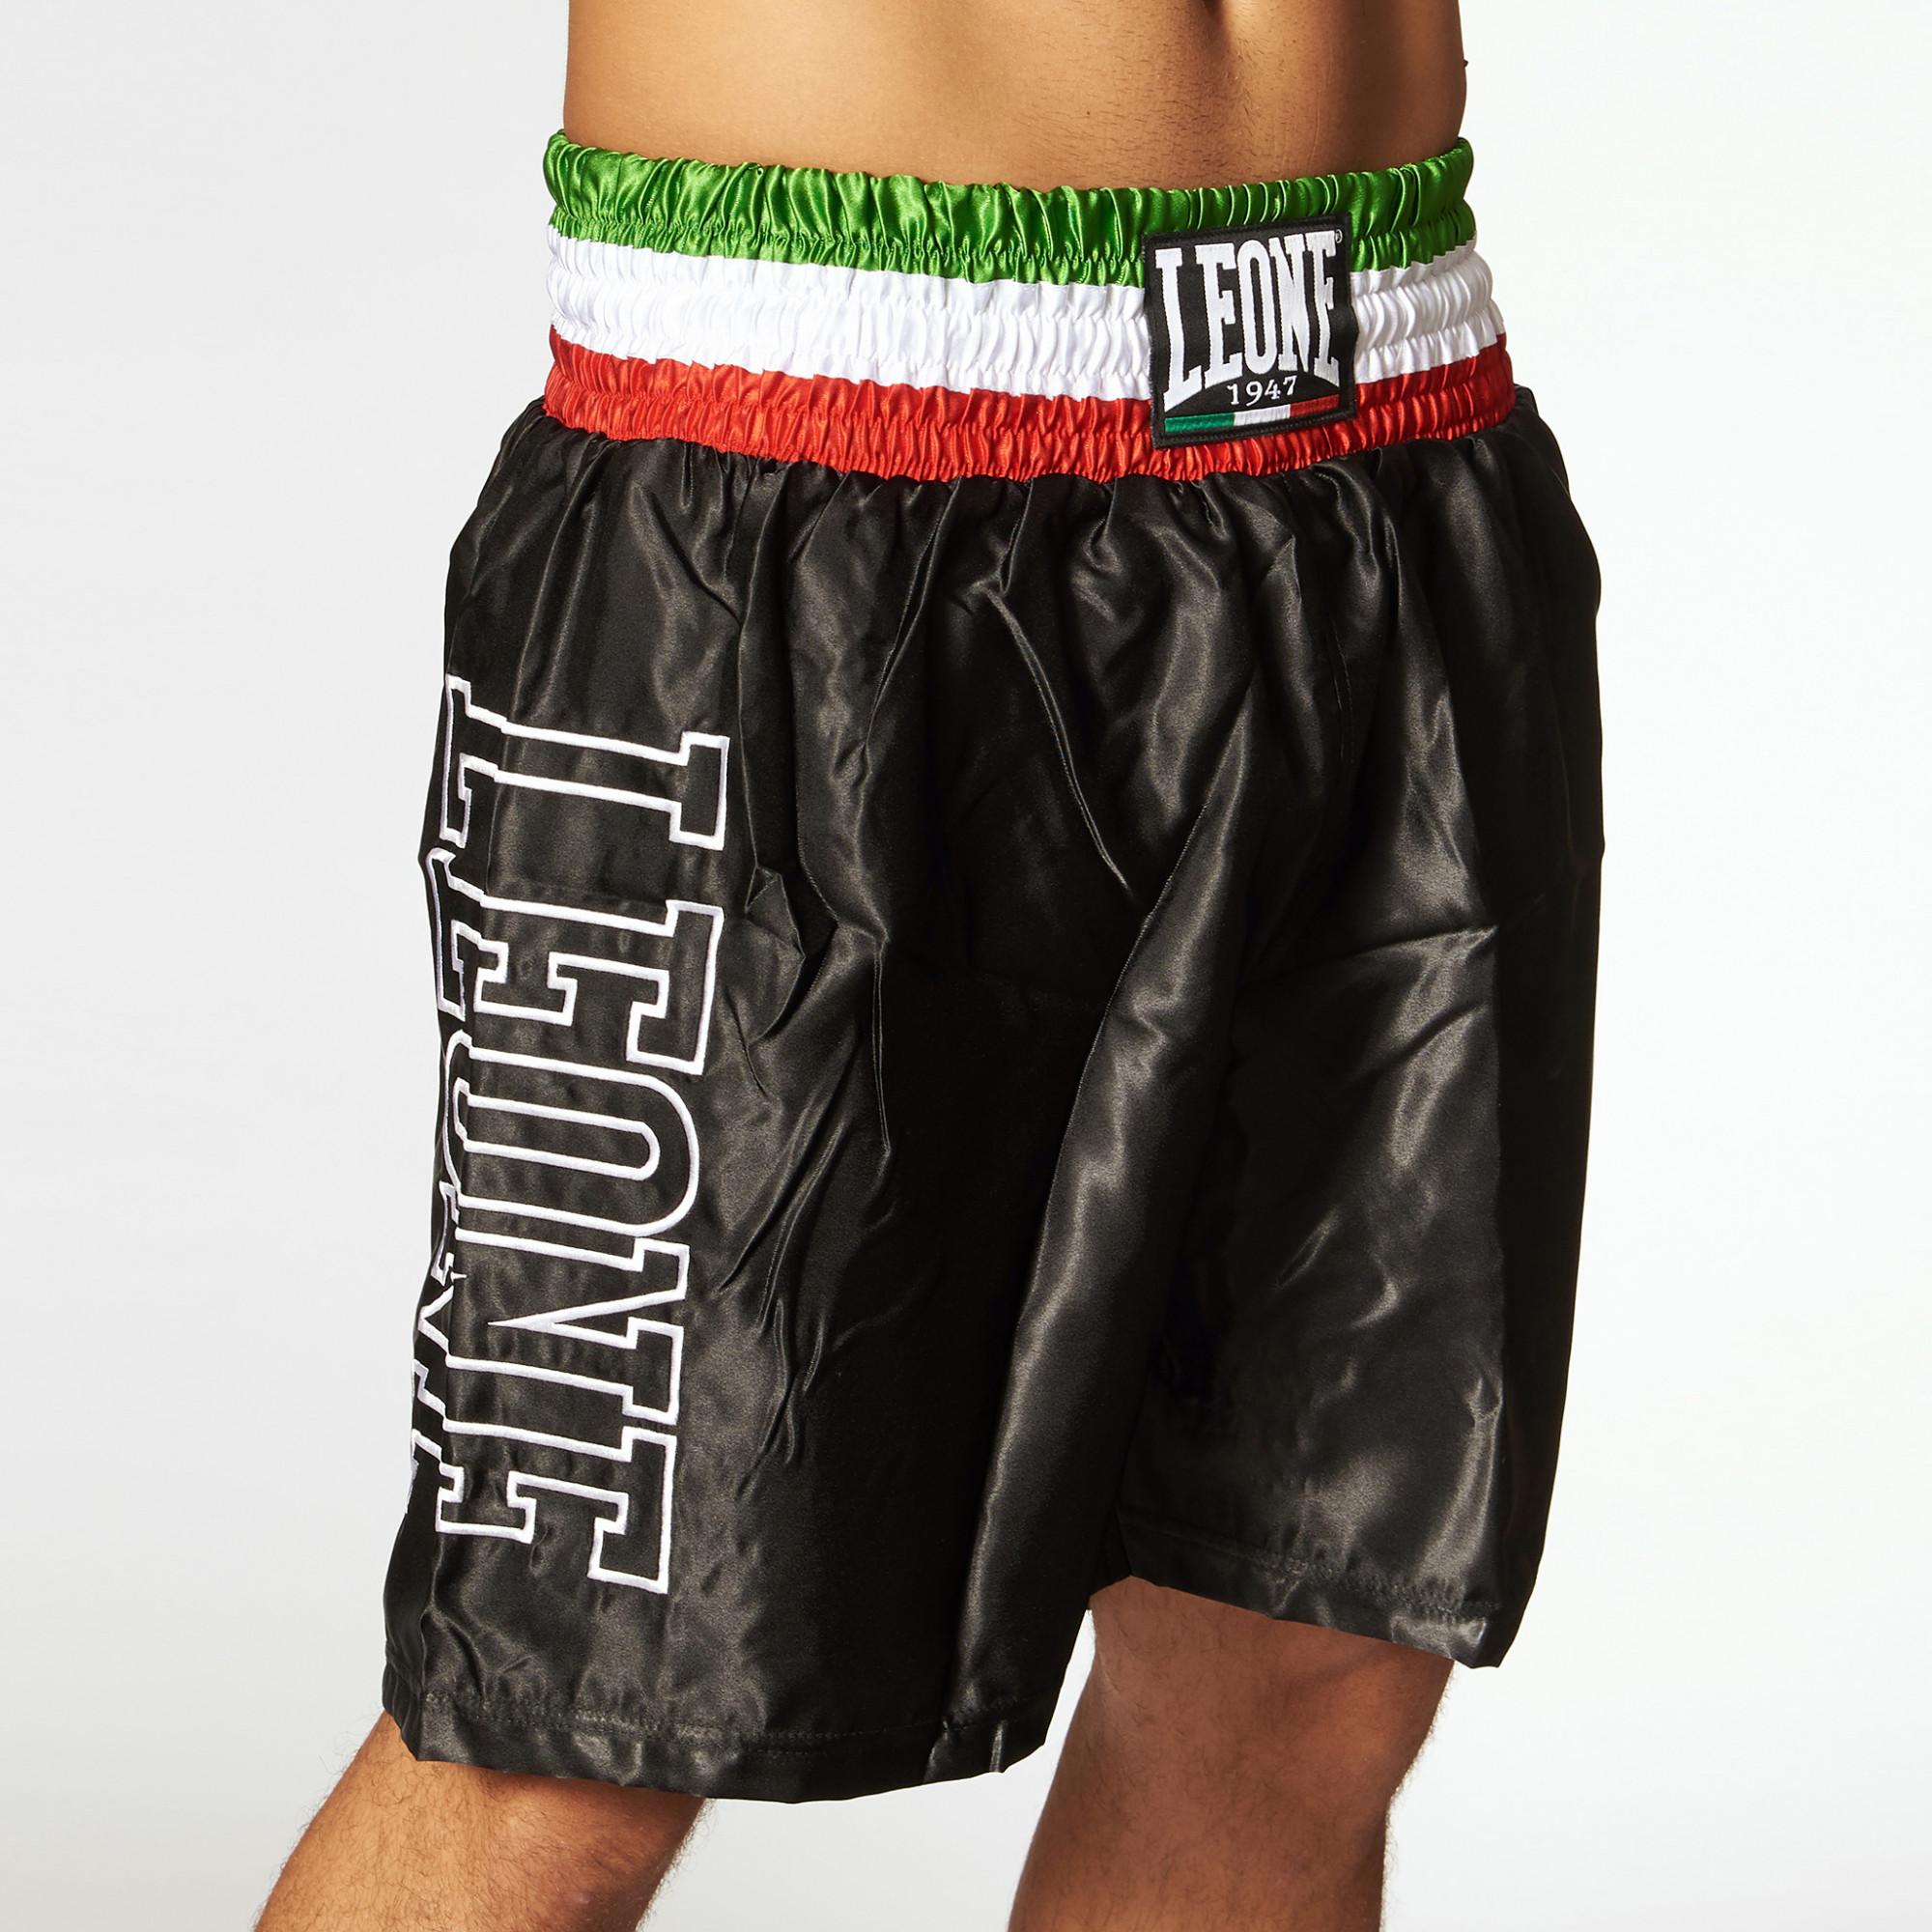 LEONE 1947 Boxing Shorts